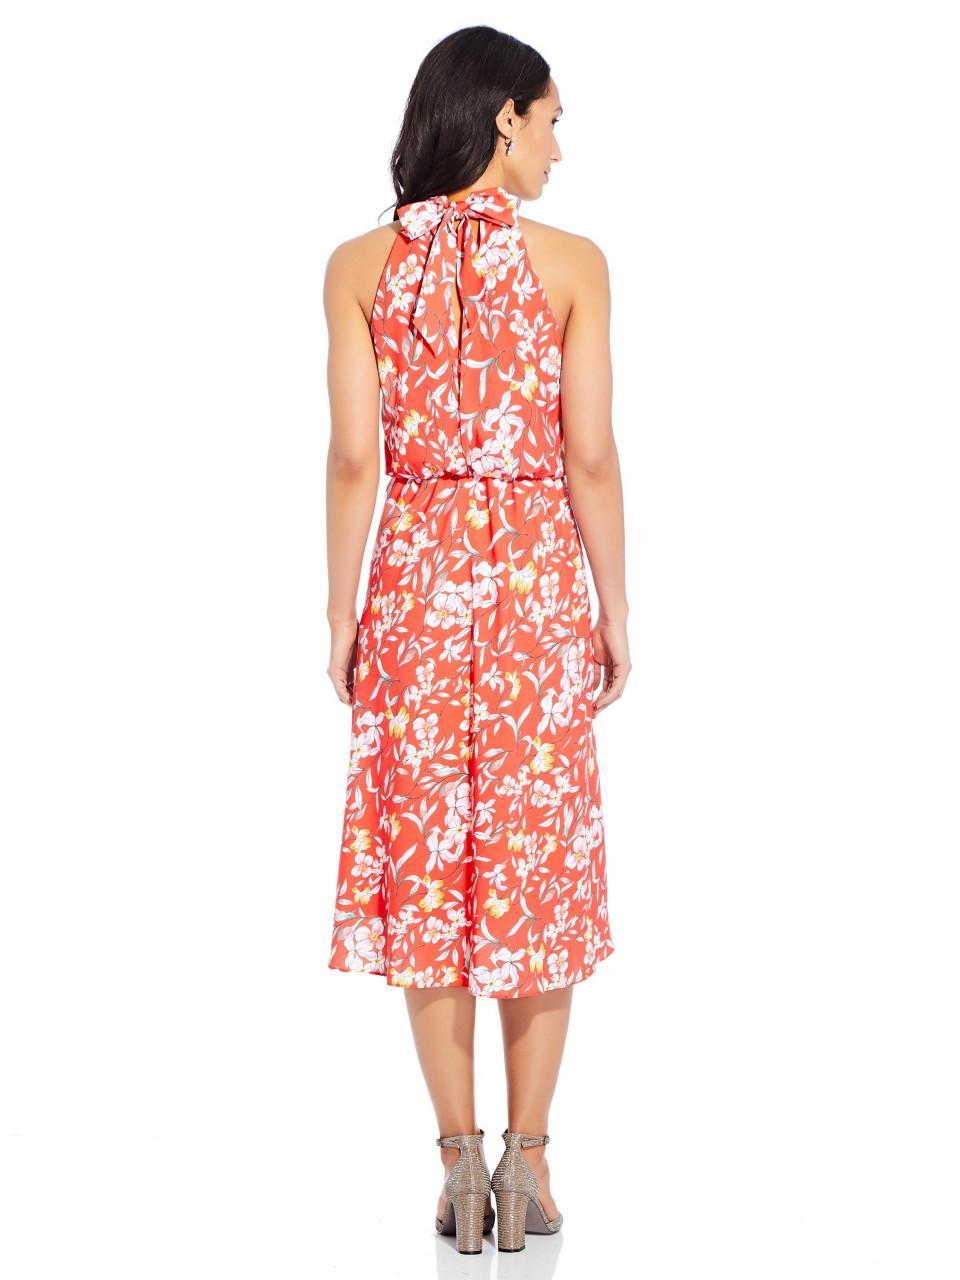 Tea time floral bias dress